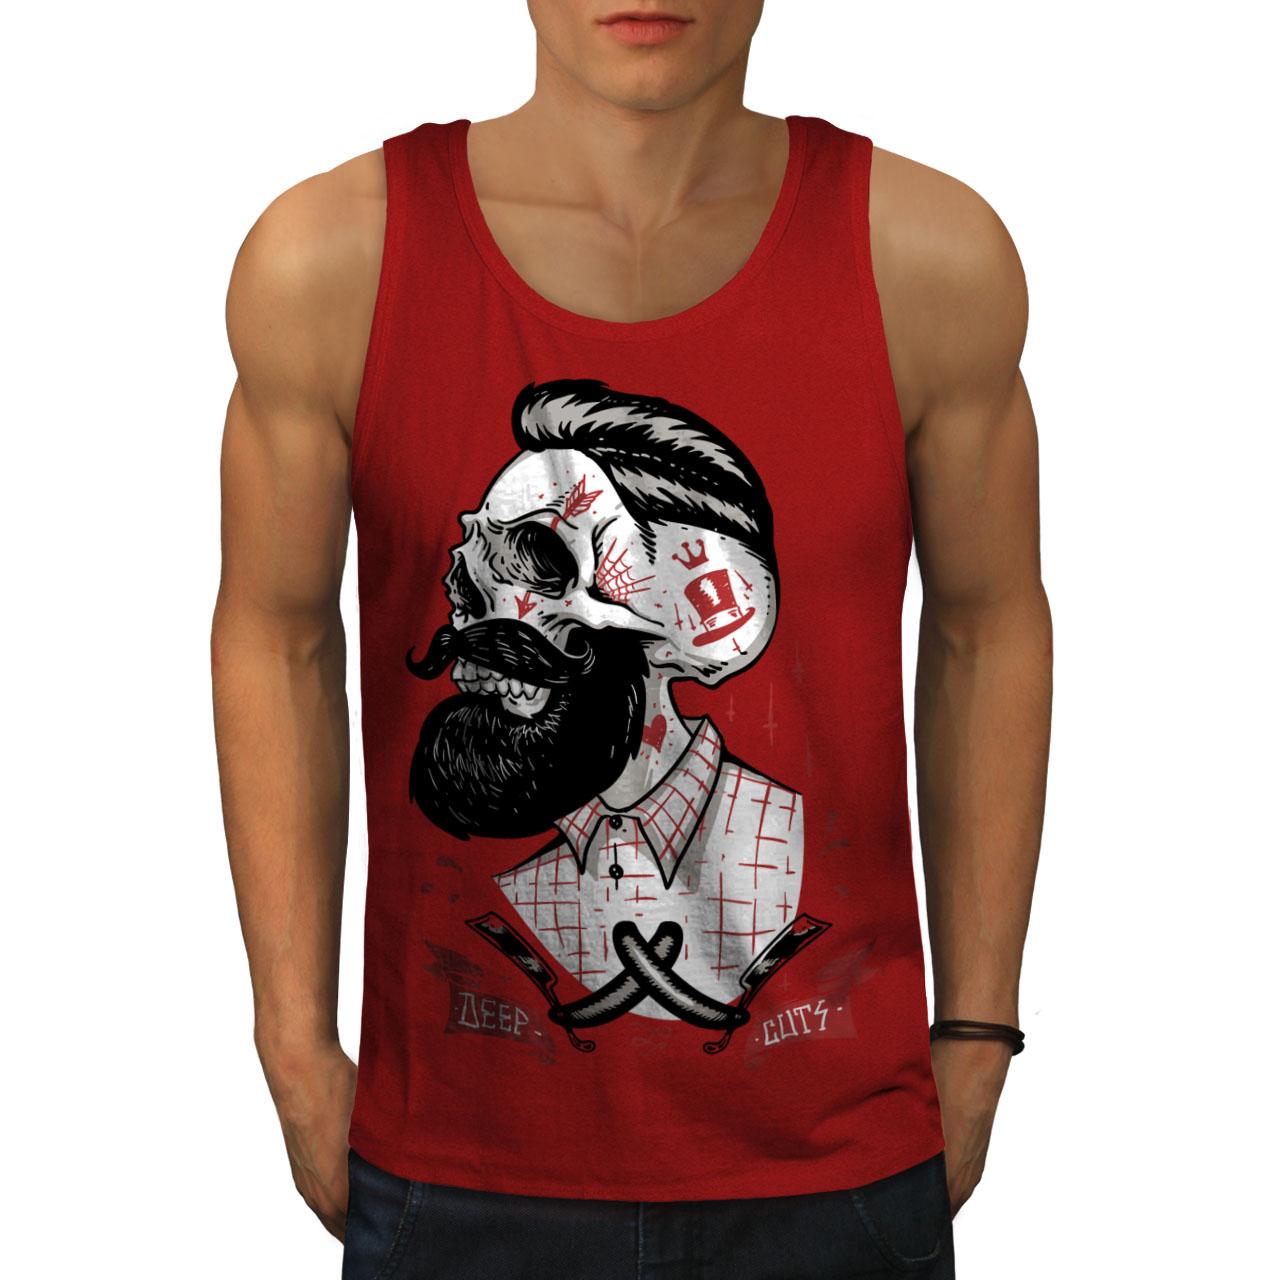 Wellcoda-Skull-Hippie-Beard-Mens-Tank-Top-Movement-Active-Sports-Shirt thumbnail 7